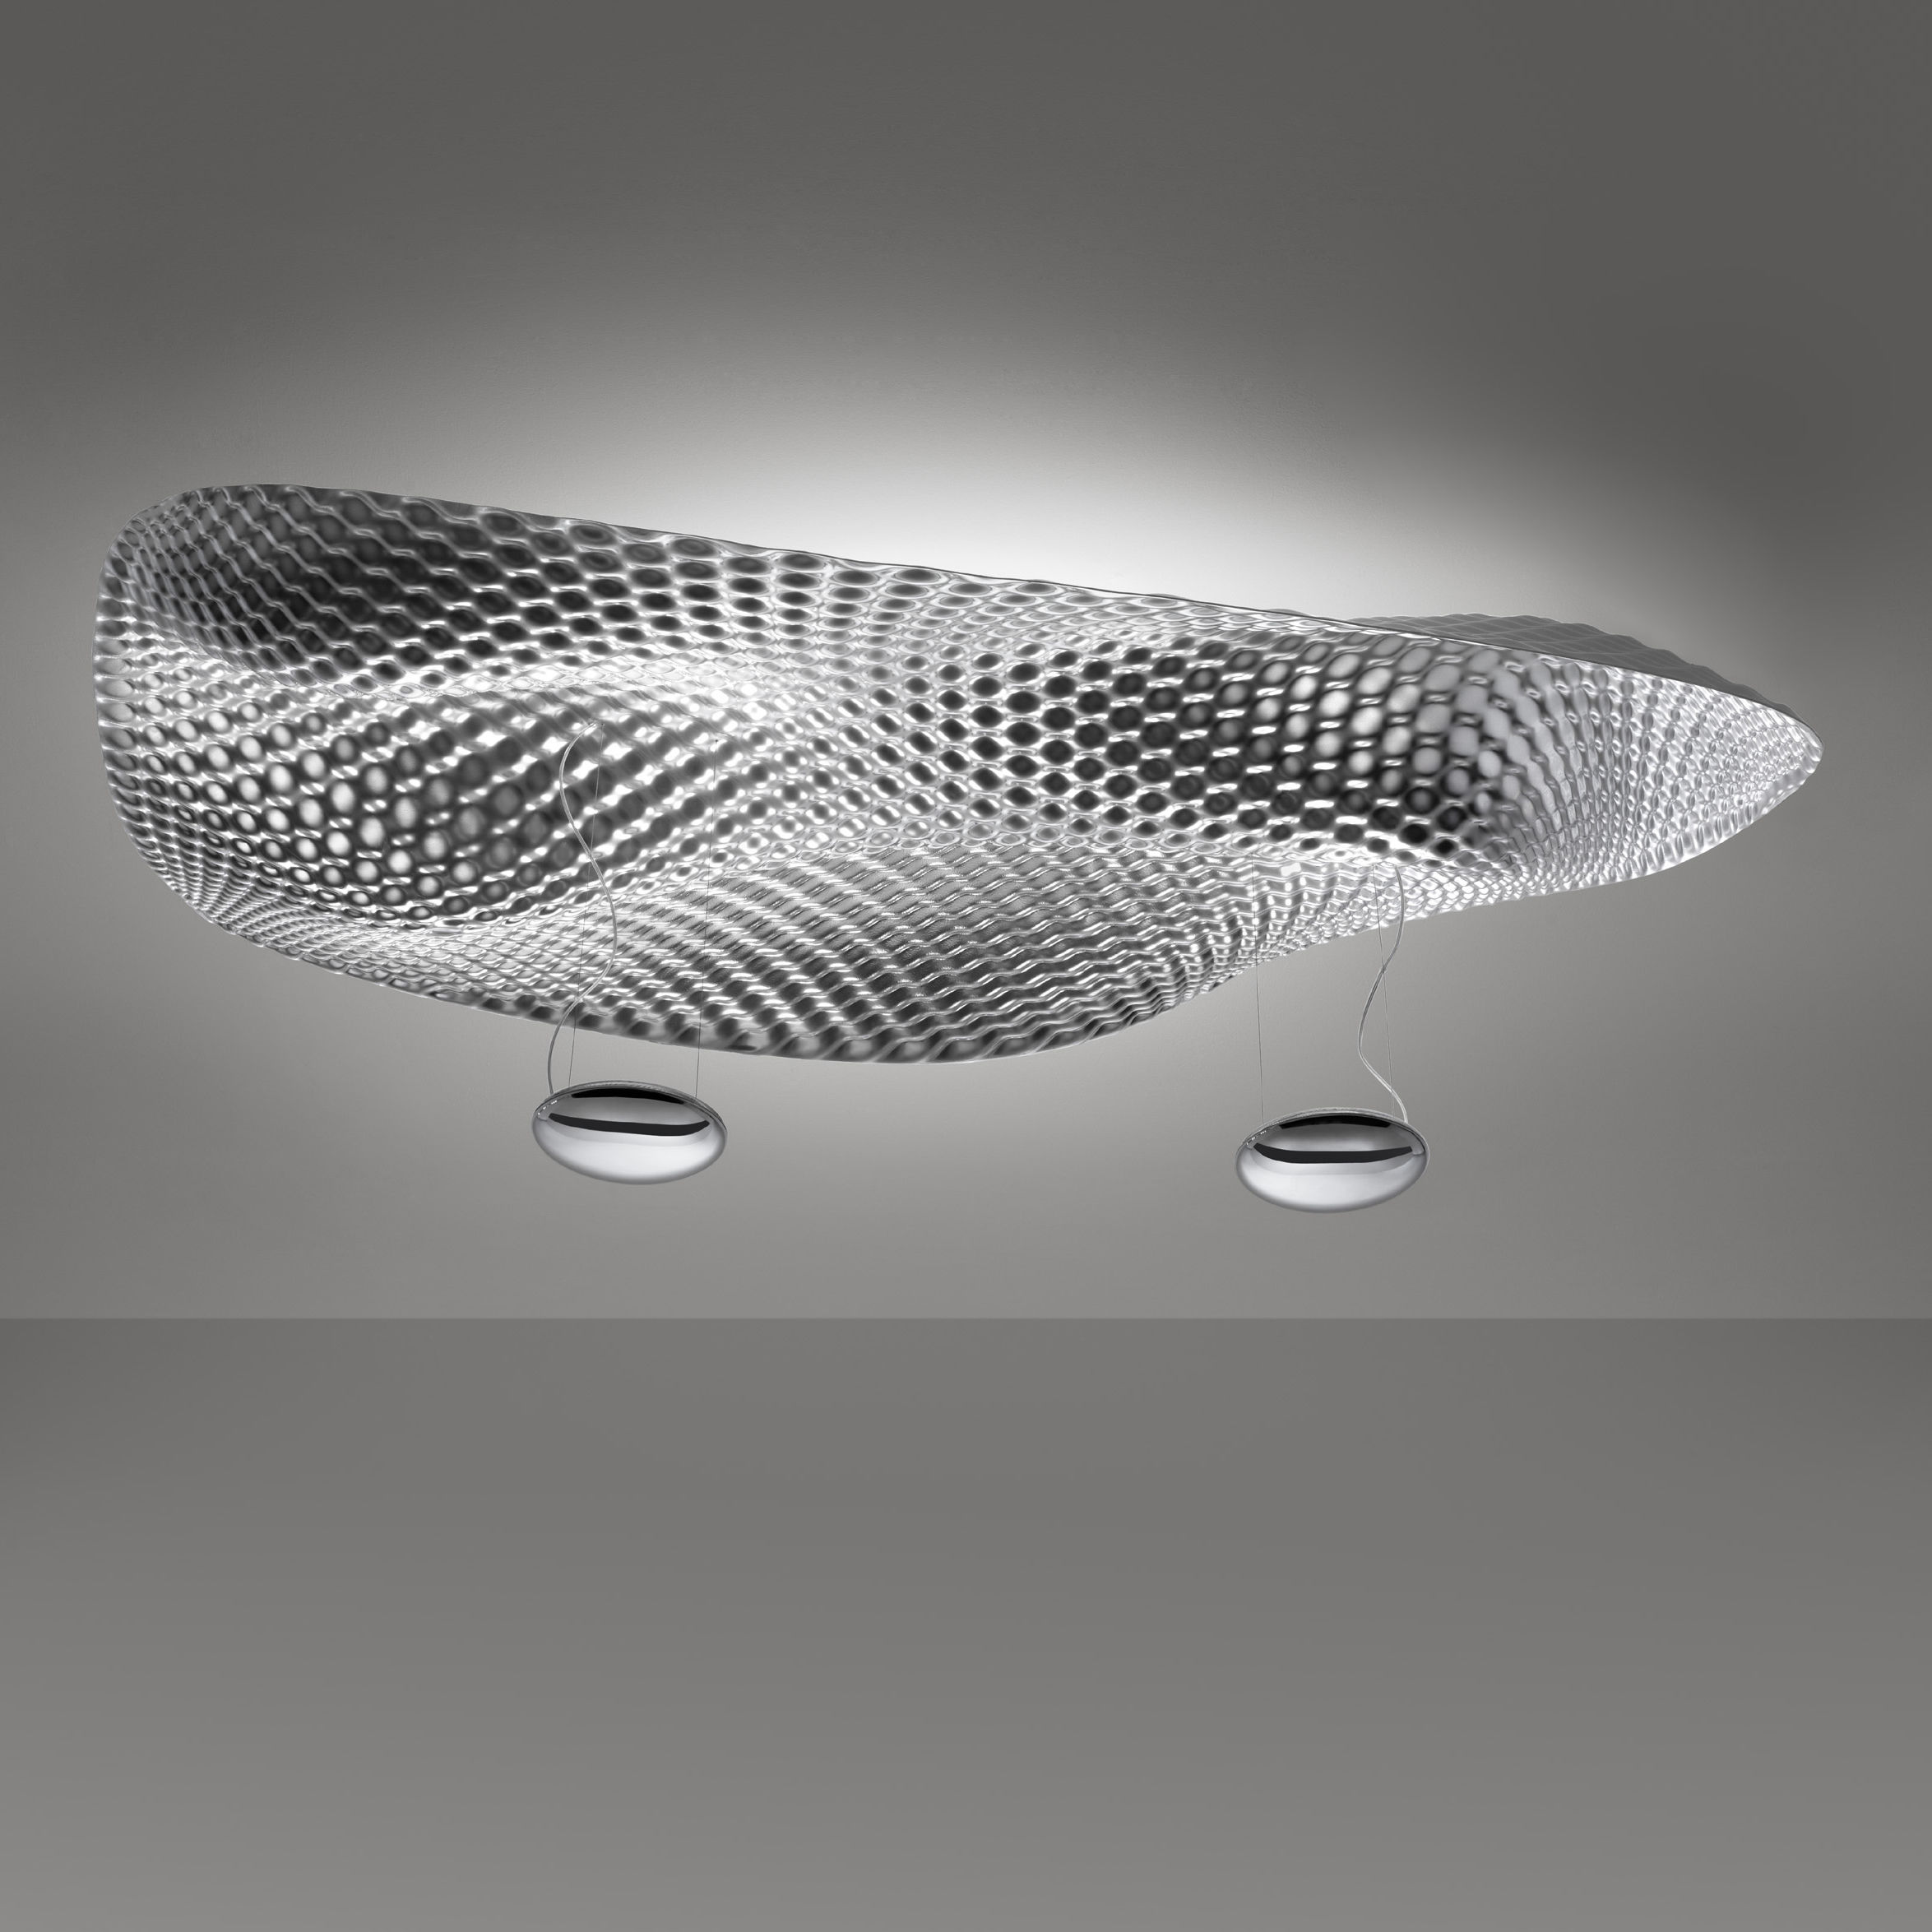 suspension cosmic angel miroir artemide. Black Bedroom Furniture Sets. Home Design Ideas